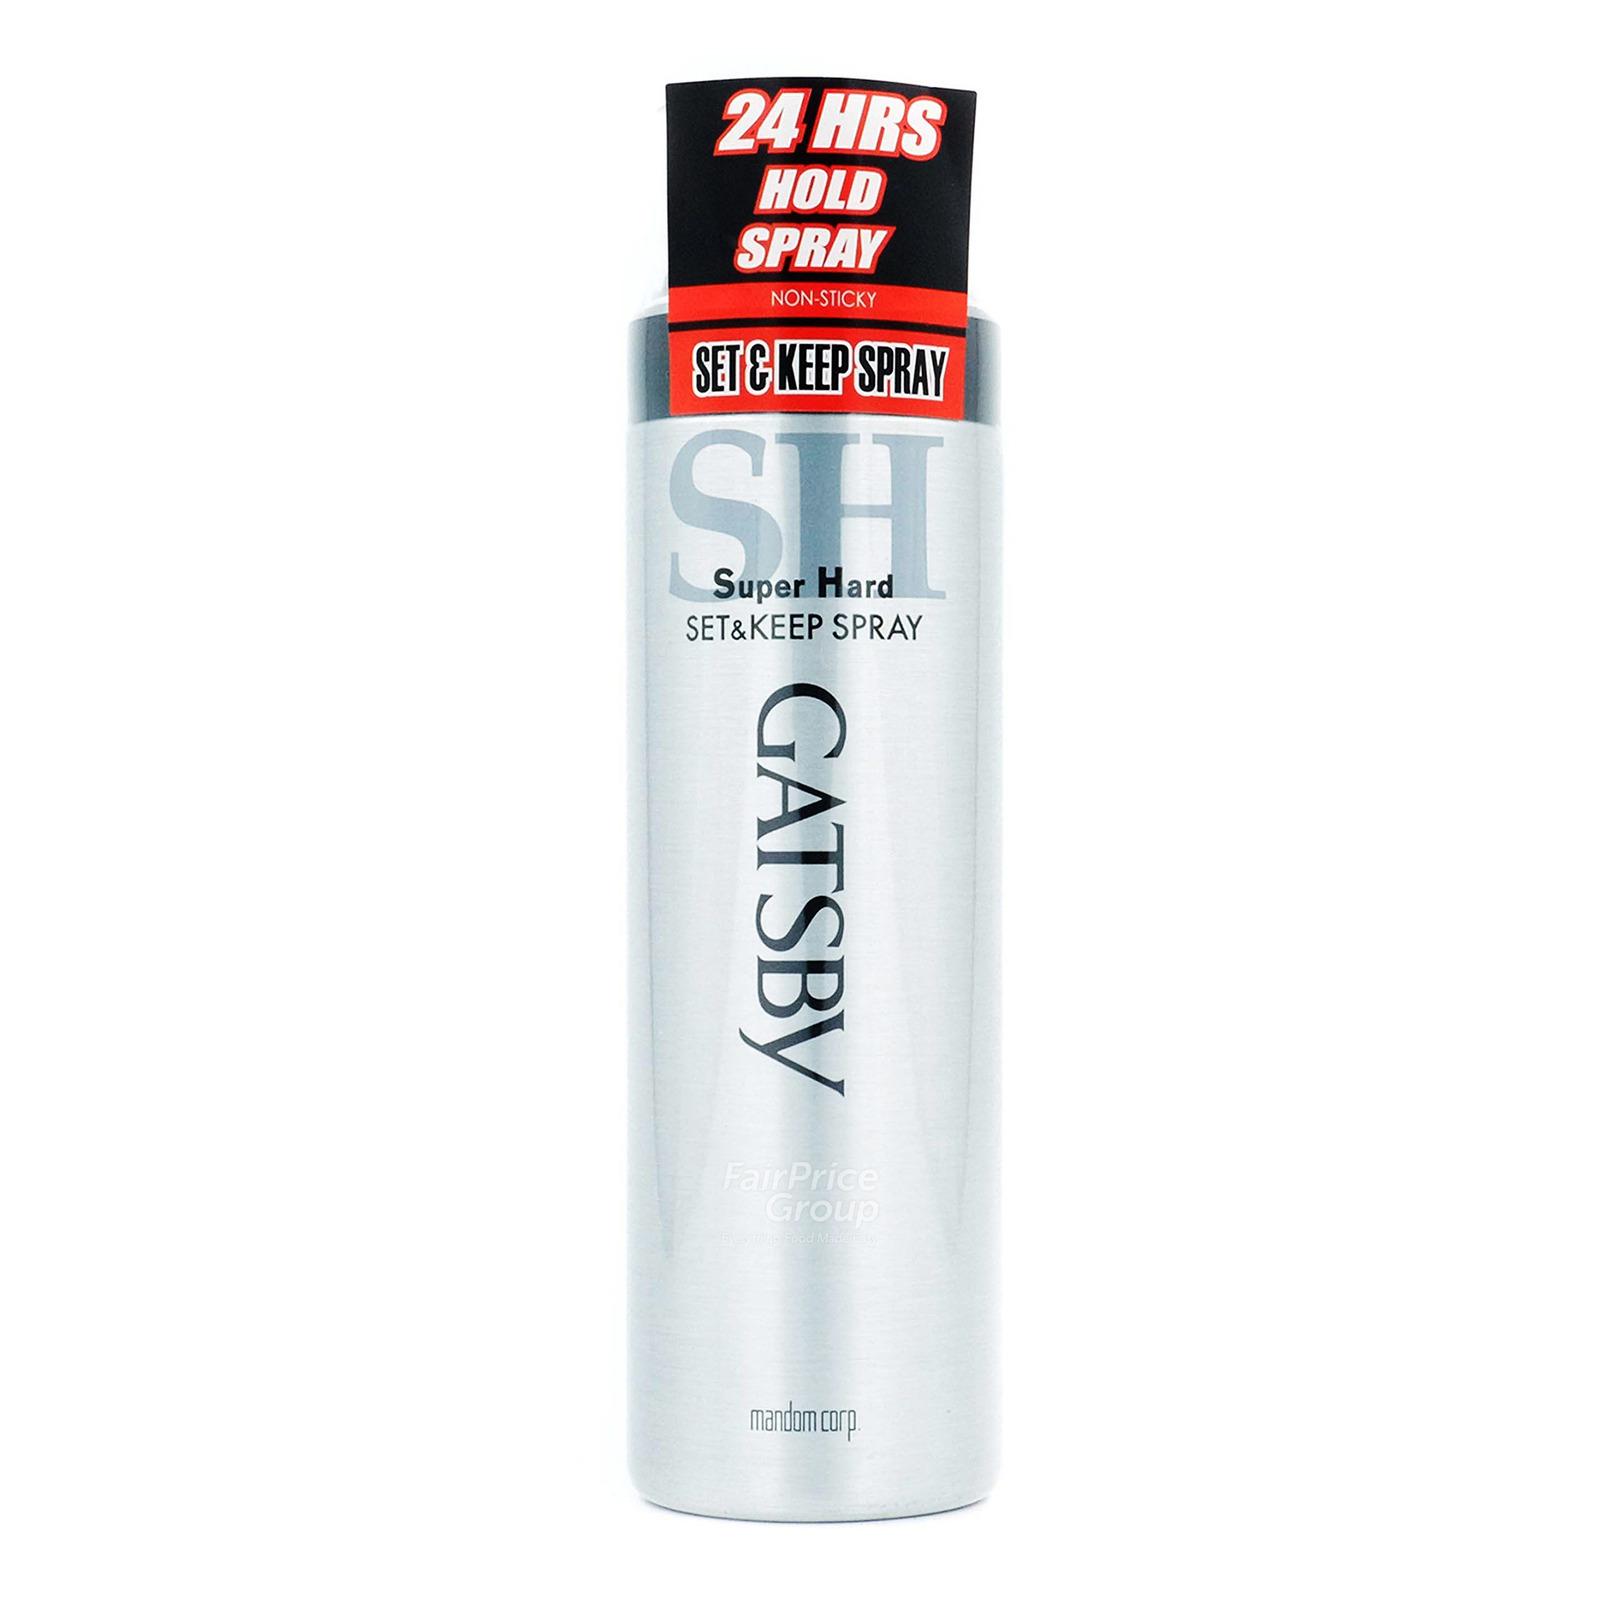 Gatsby Set & Keep Spray - Super Hard